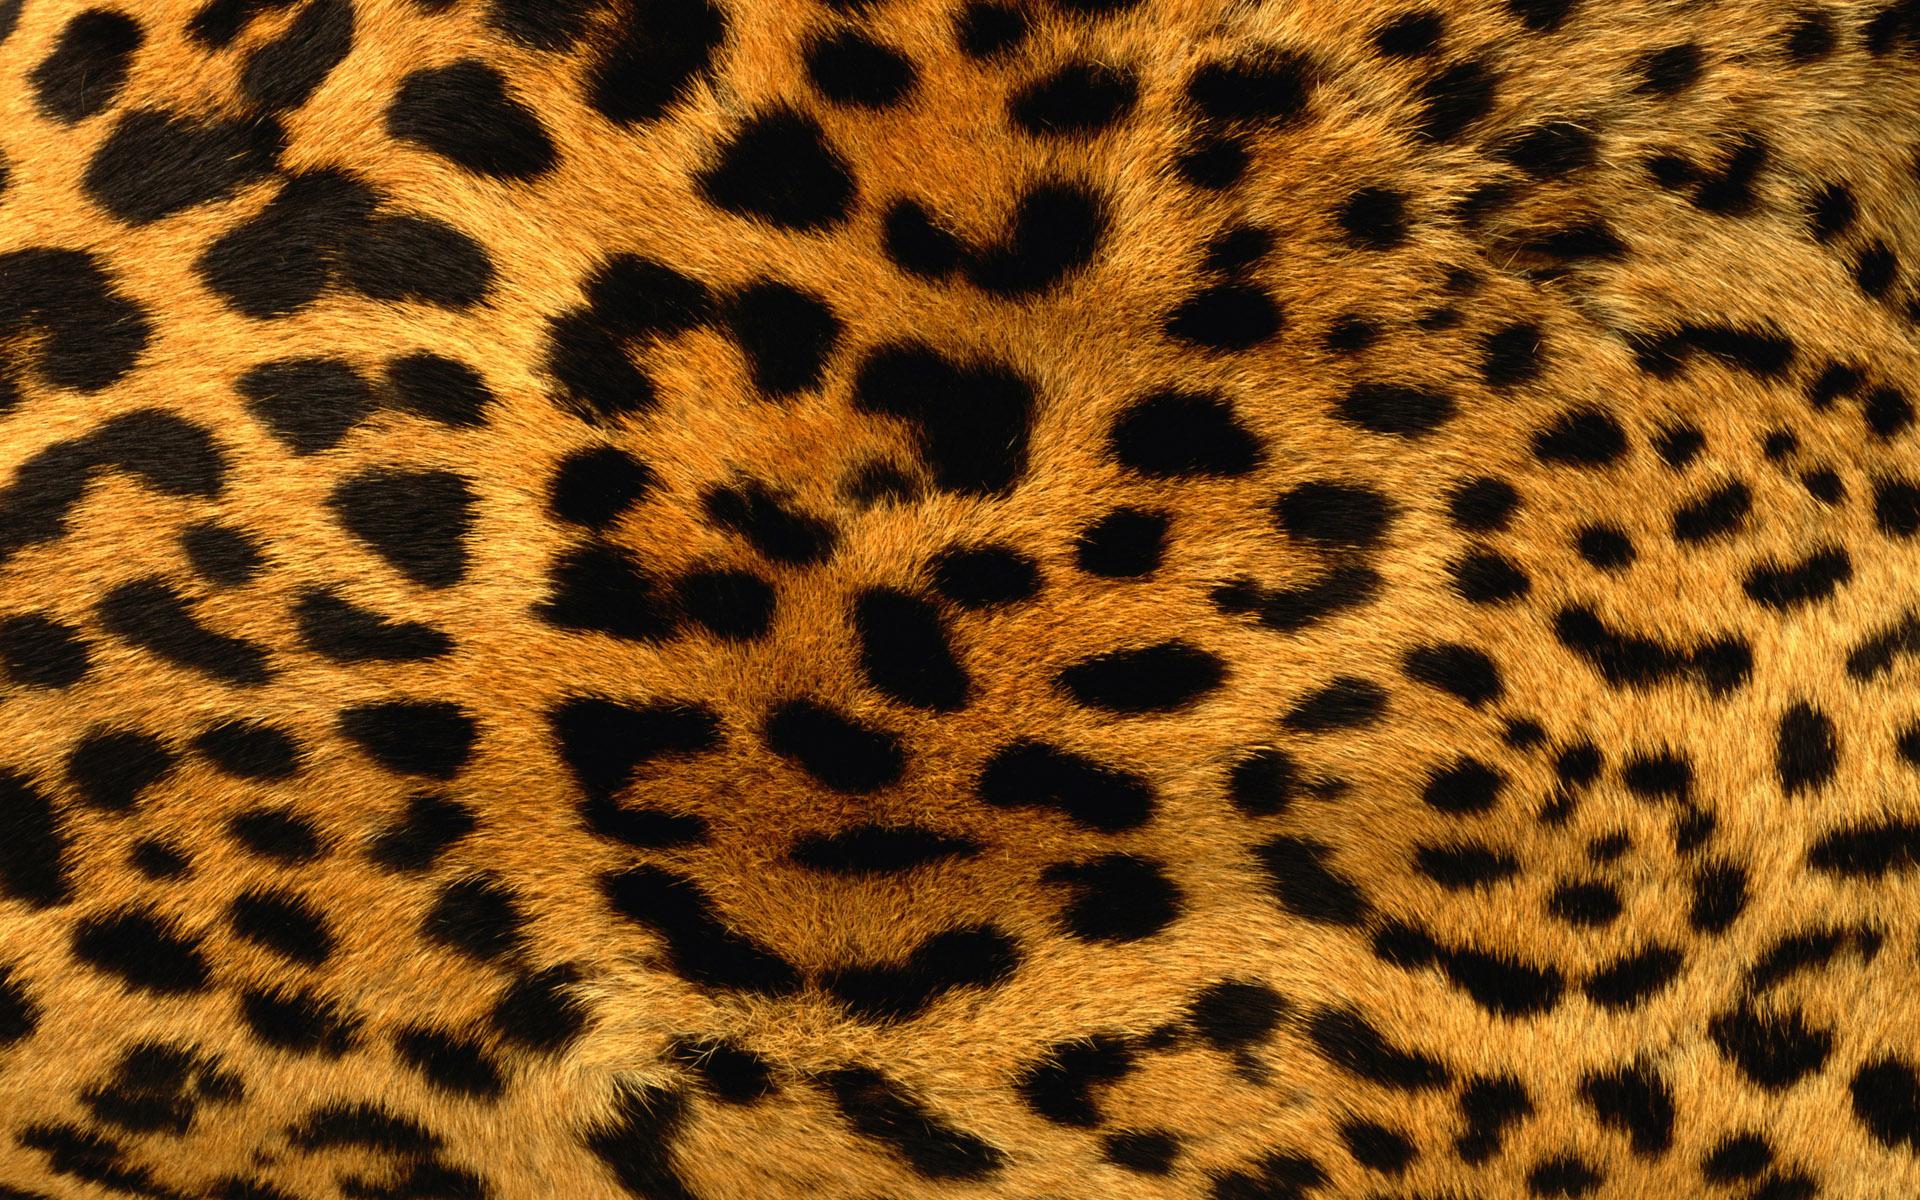 Leopard Backgrounds